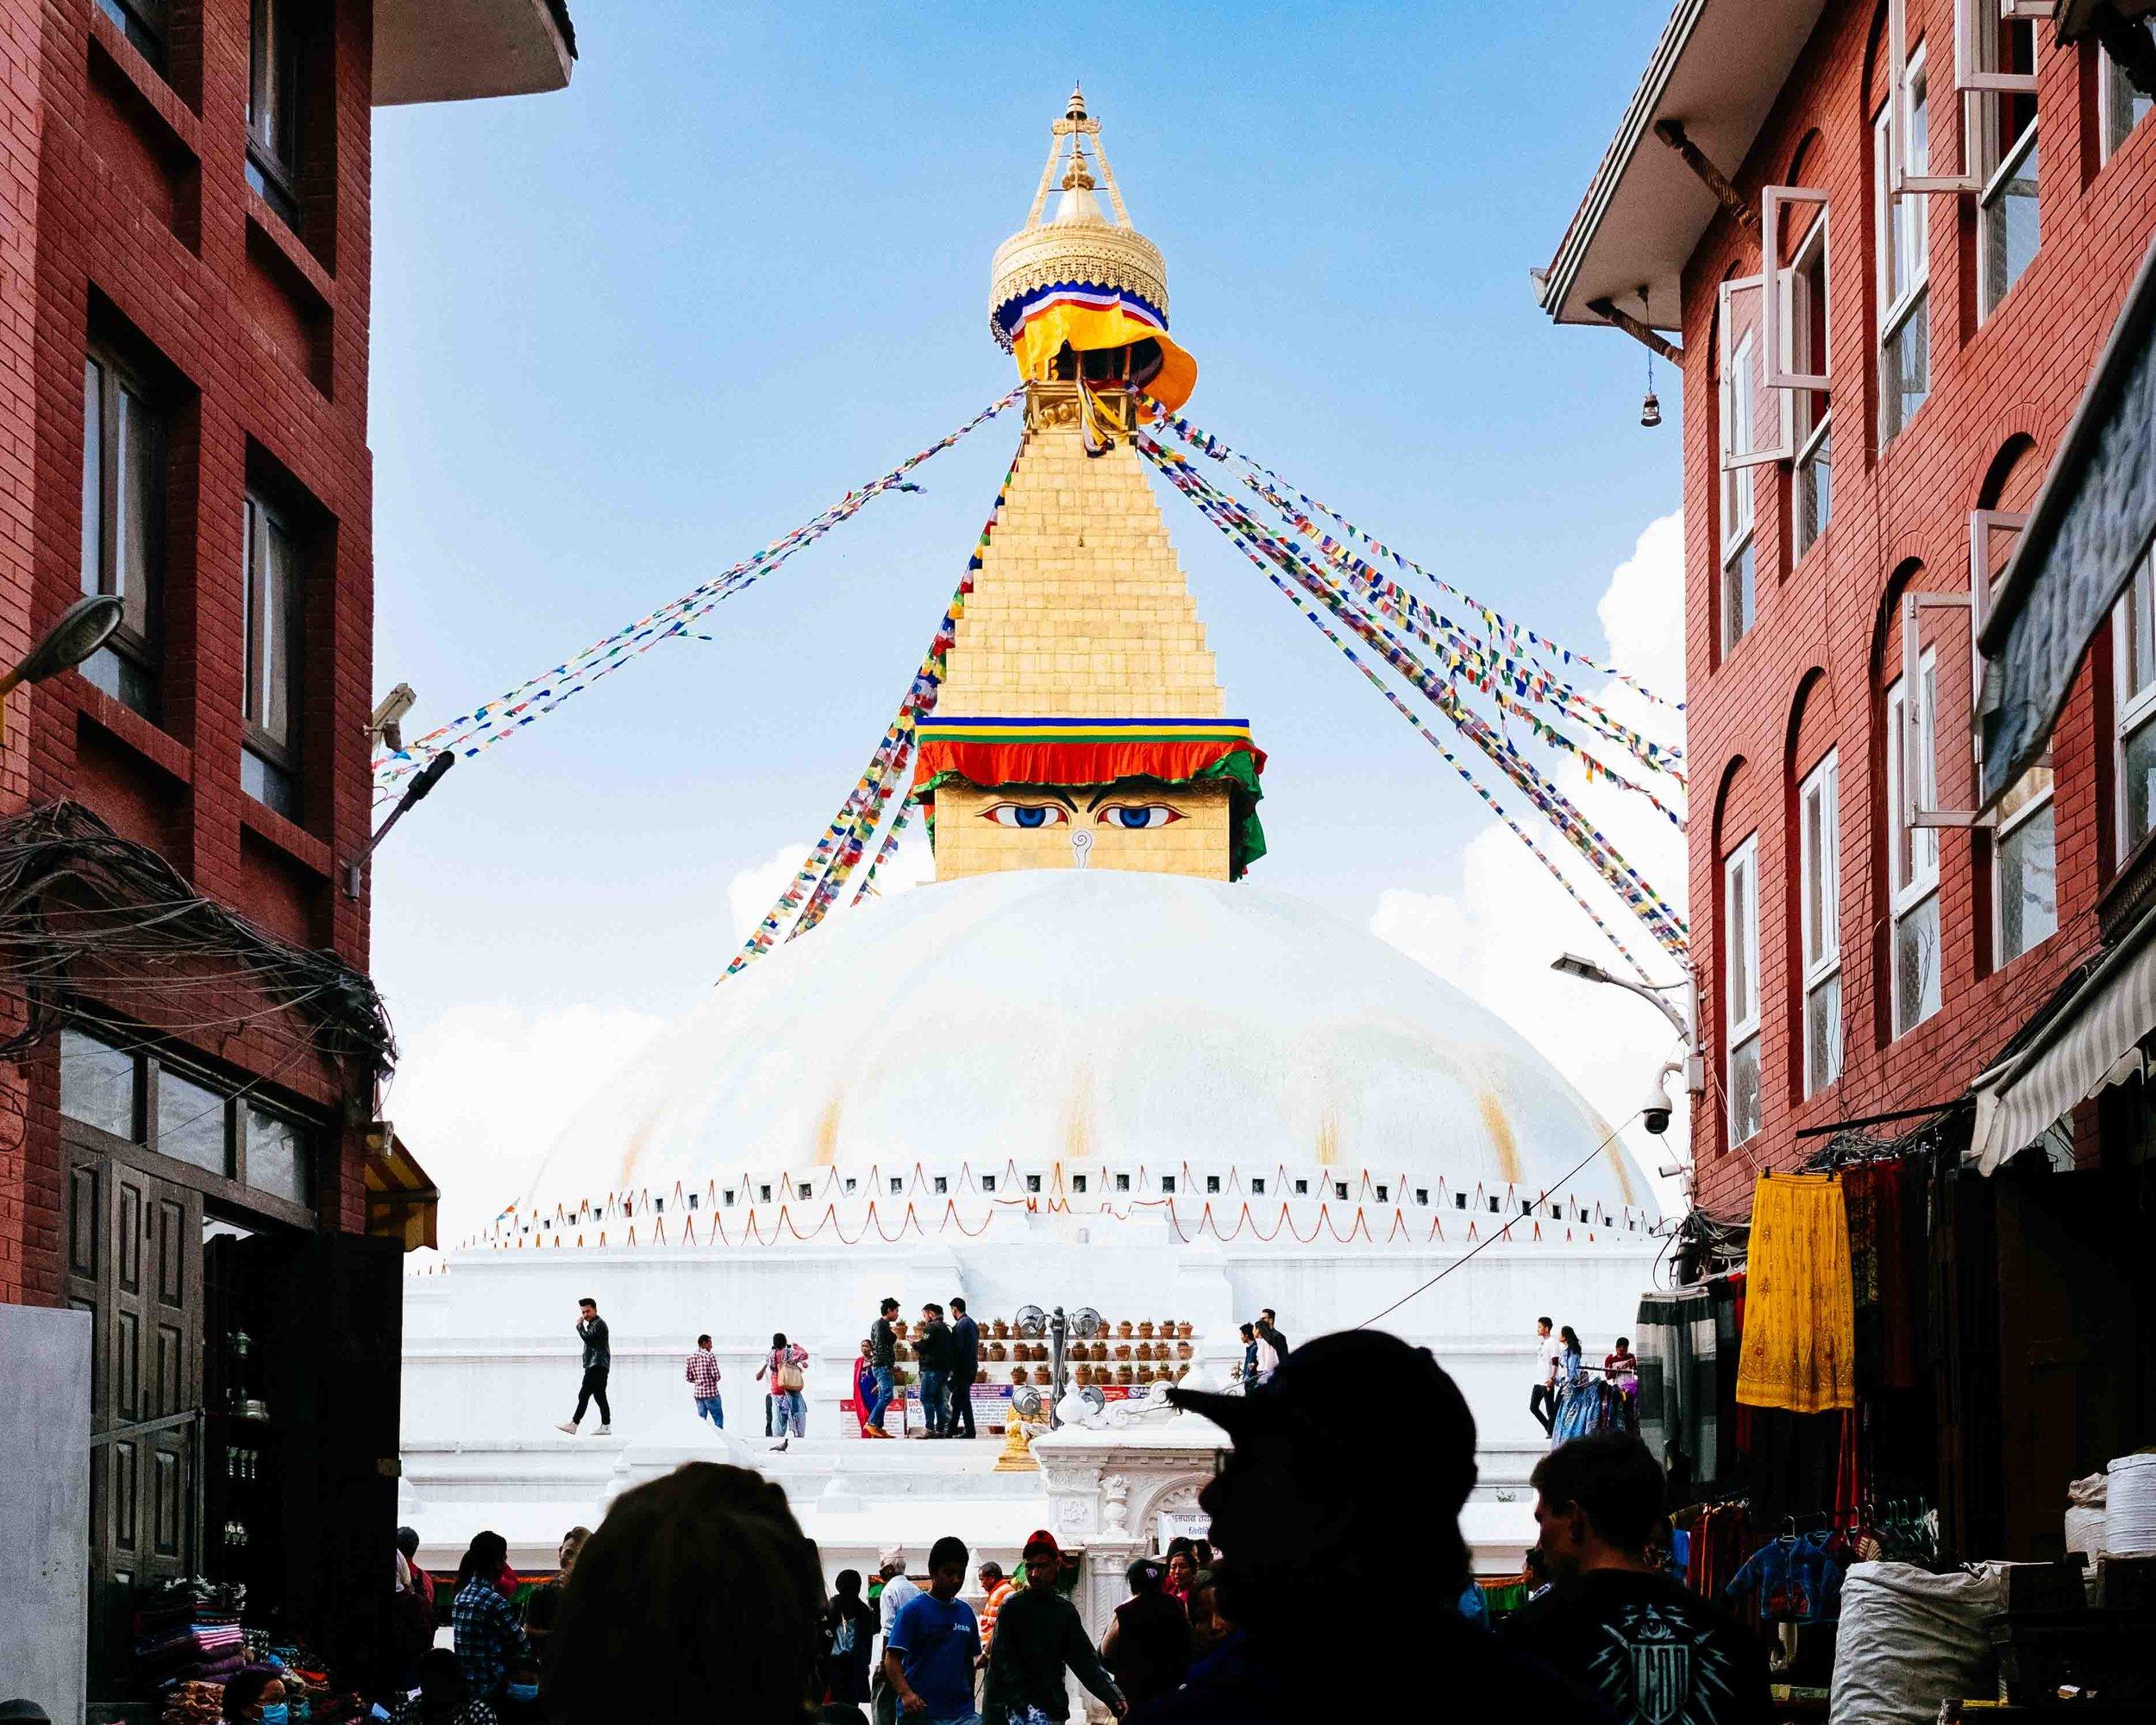 The Boudhanath Stupa in Kathmandu, Nepal.